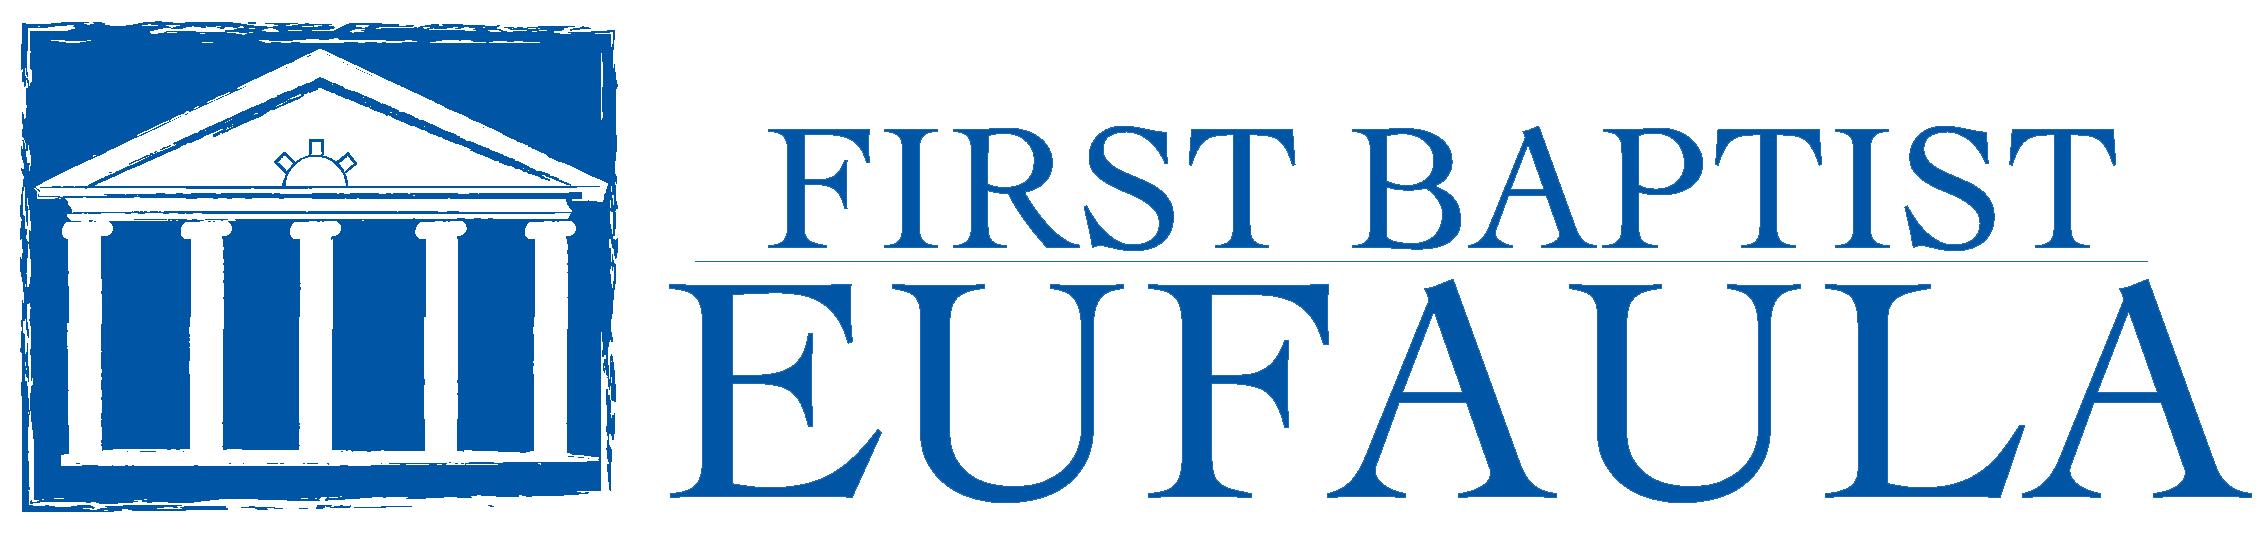 First Baptist Church of Eufaula